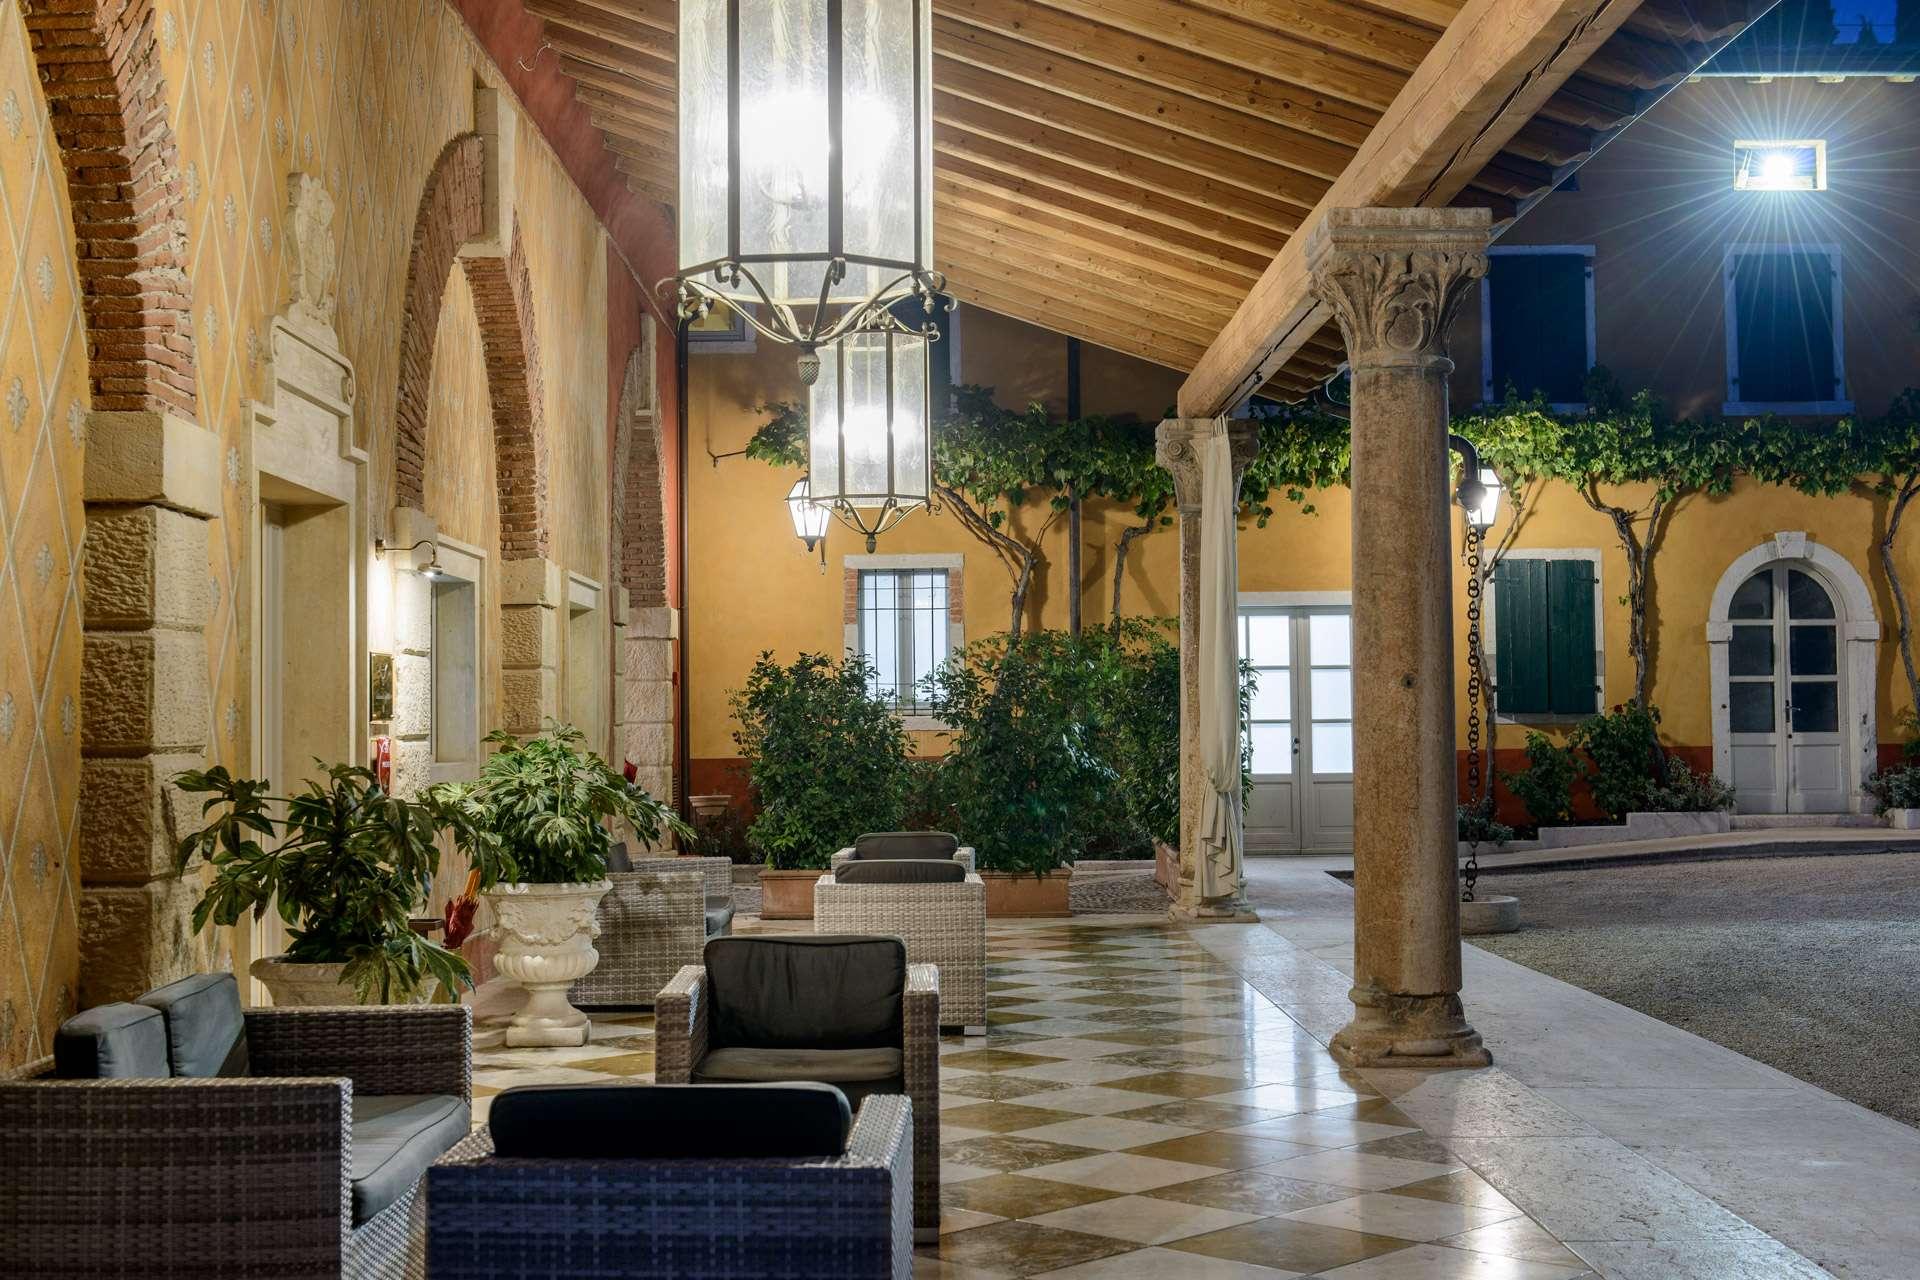 Wine-Relais-Chateaux-Lago-di-Garda-Villa-Cordevigo - Luxury Yoga Wine Tours with Sensi e Diletti